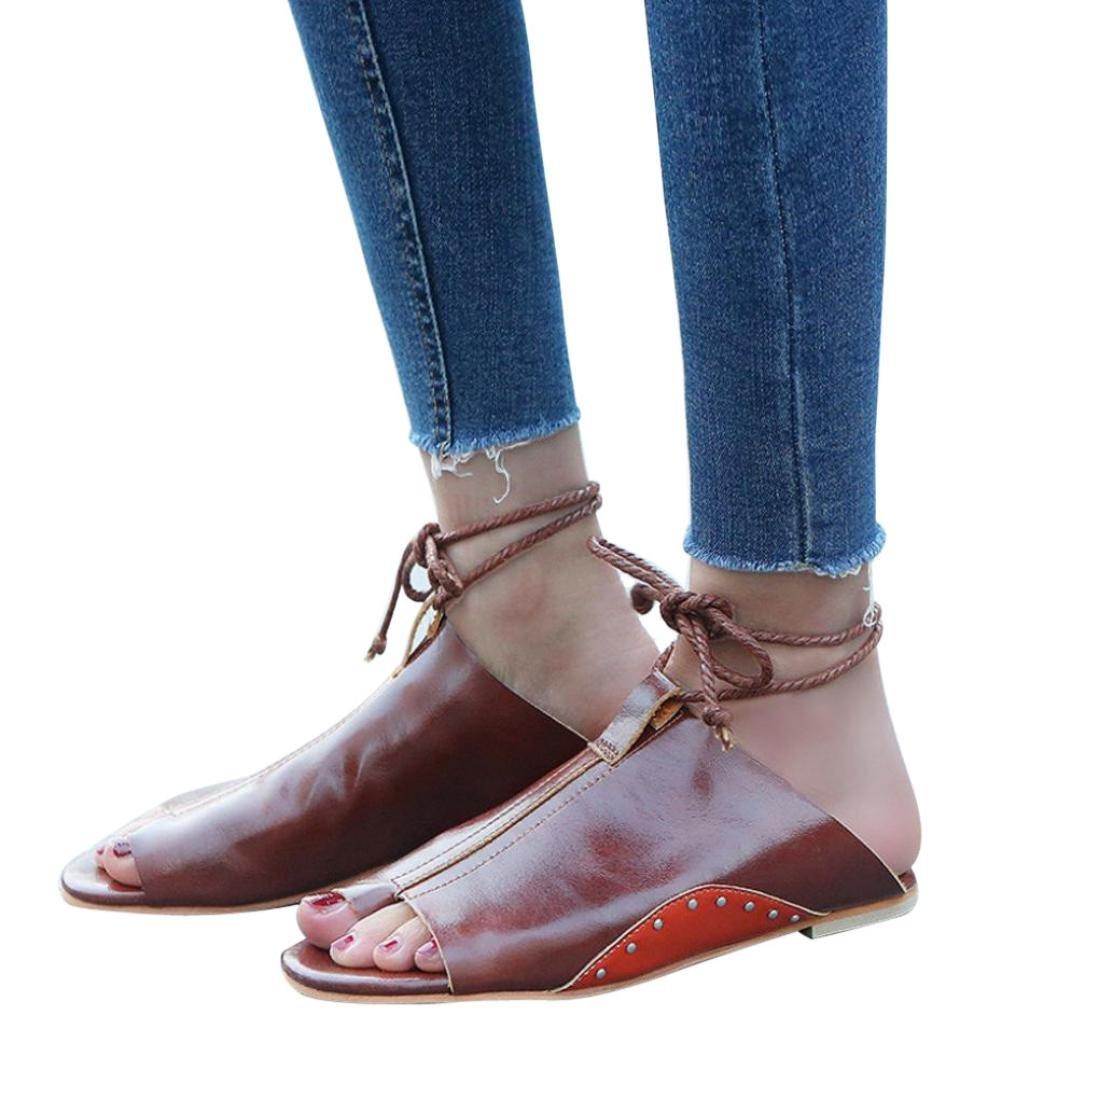 Sommer Sandalen,Resplend Frauen Sandalen Rouml;mersandalen mit Flachem Boden Mode Offene Knouml;chel Bandage Plattform Keile Schuhe Gladiator Casual Sandalen Flip-Flop Schuhe35(Asian35=EU34)|Braun